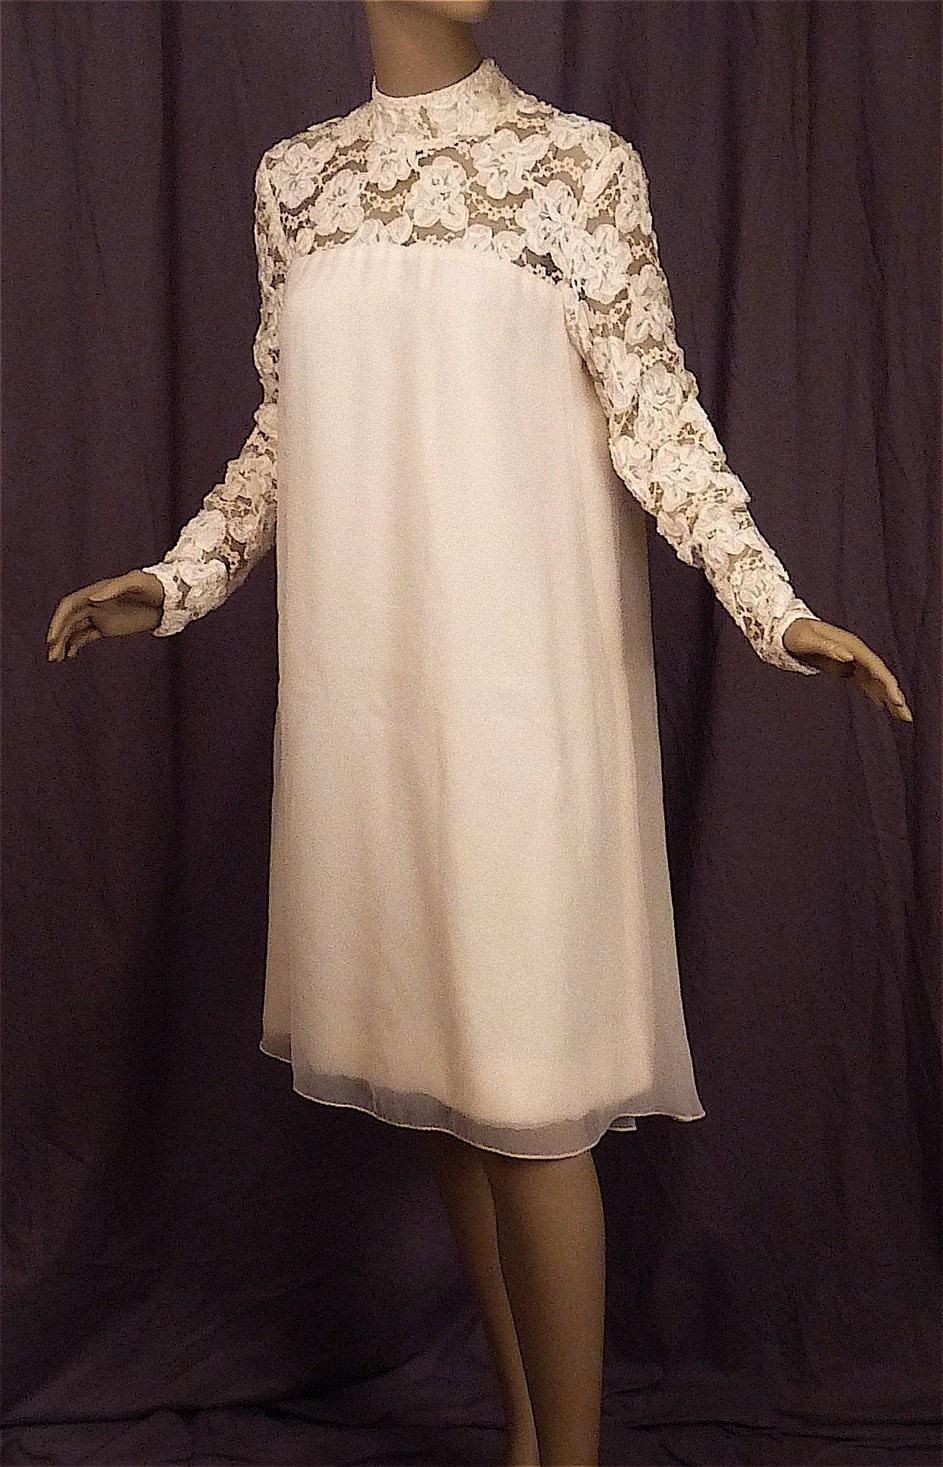 Priscilla presley 60s wedding dress for 60s style wedding dresses